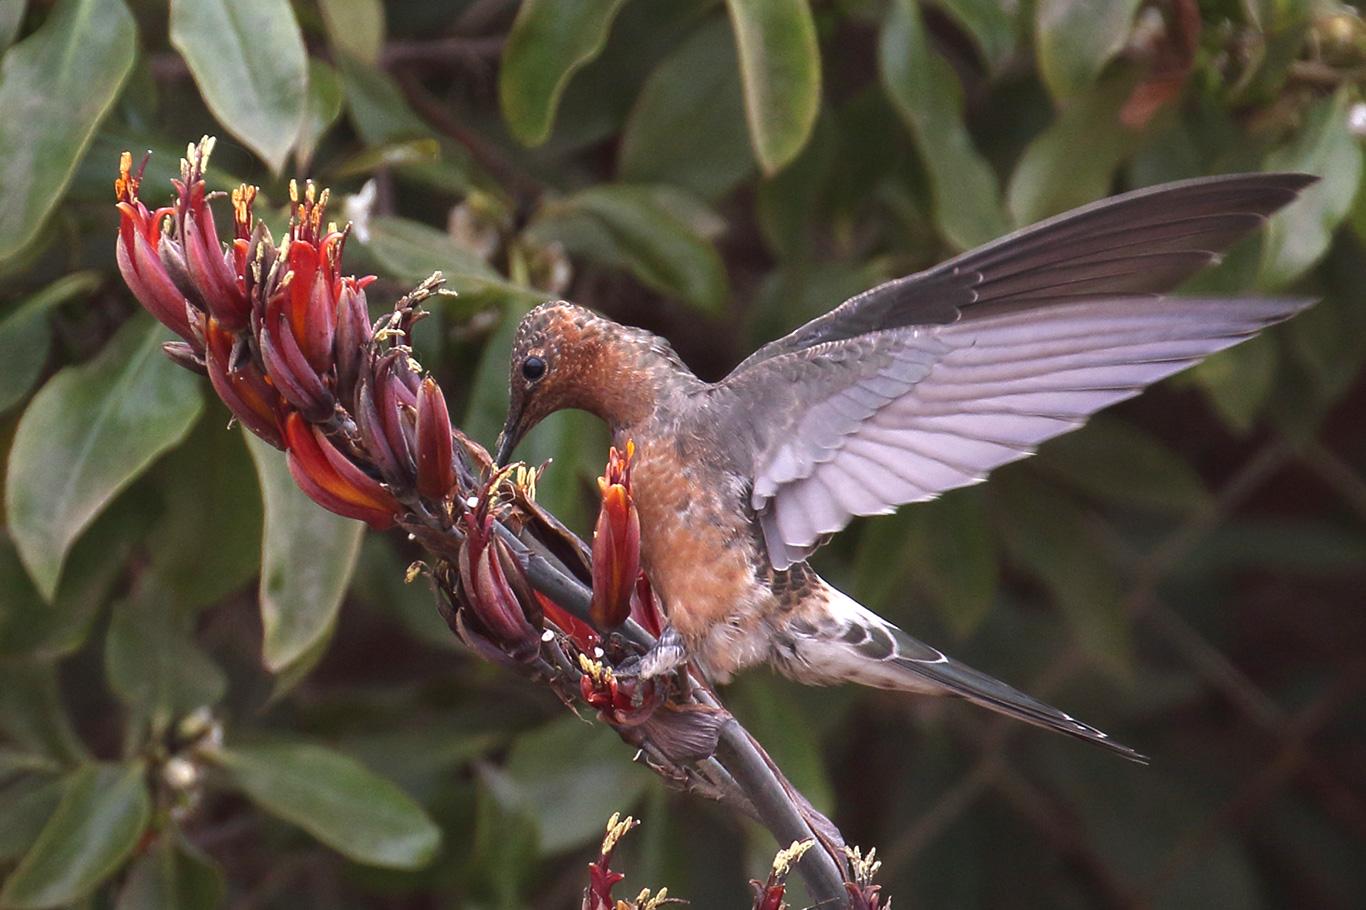 Giant Hummingbird, Parque Humedal Río Maípo, Chile.